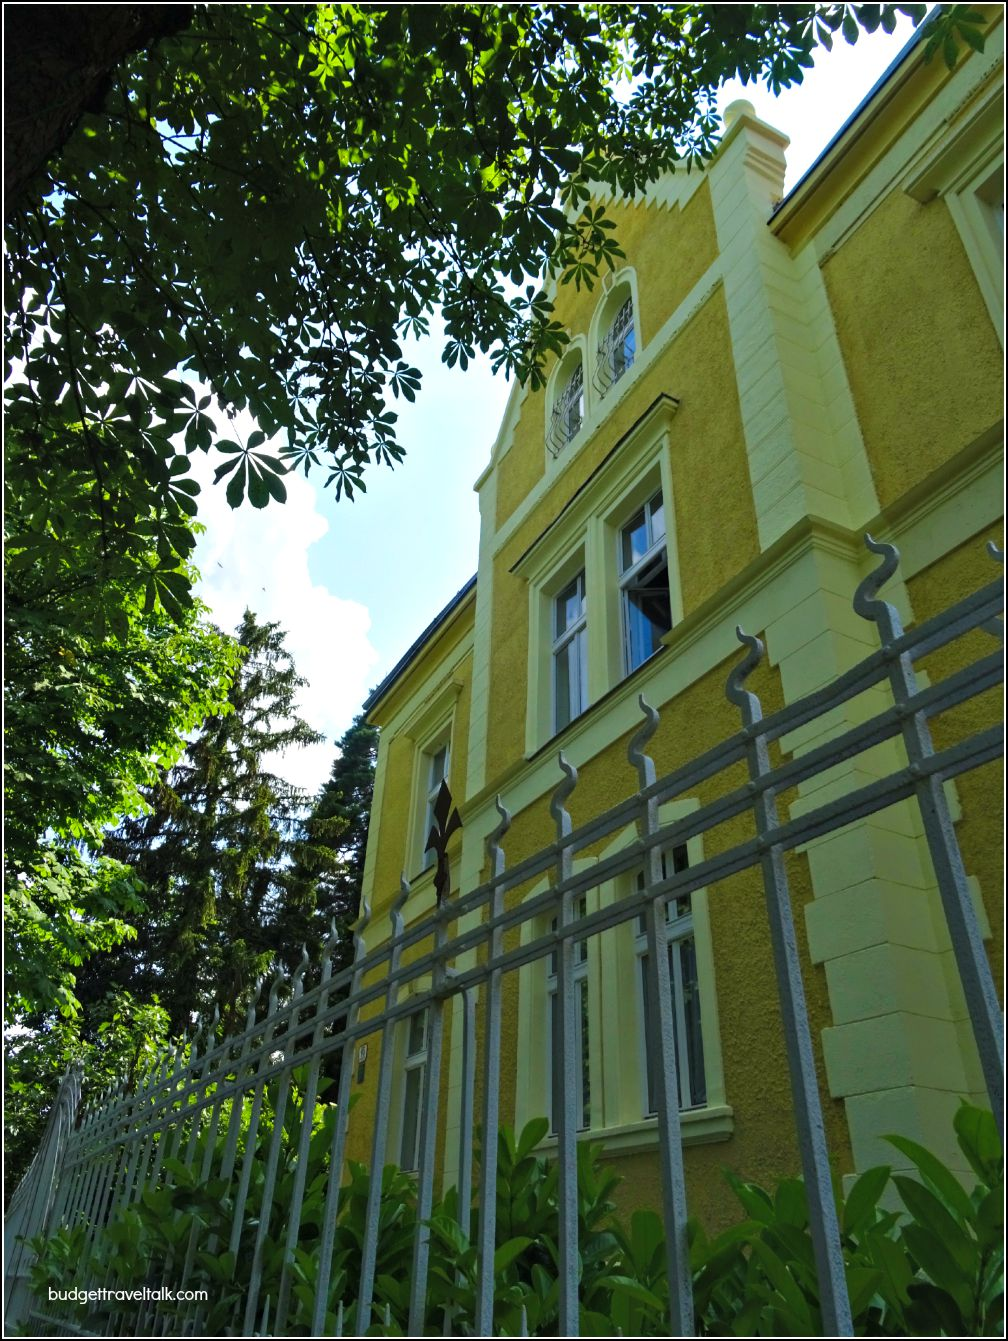 Zagreb Jurjevska Street yellow building